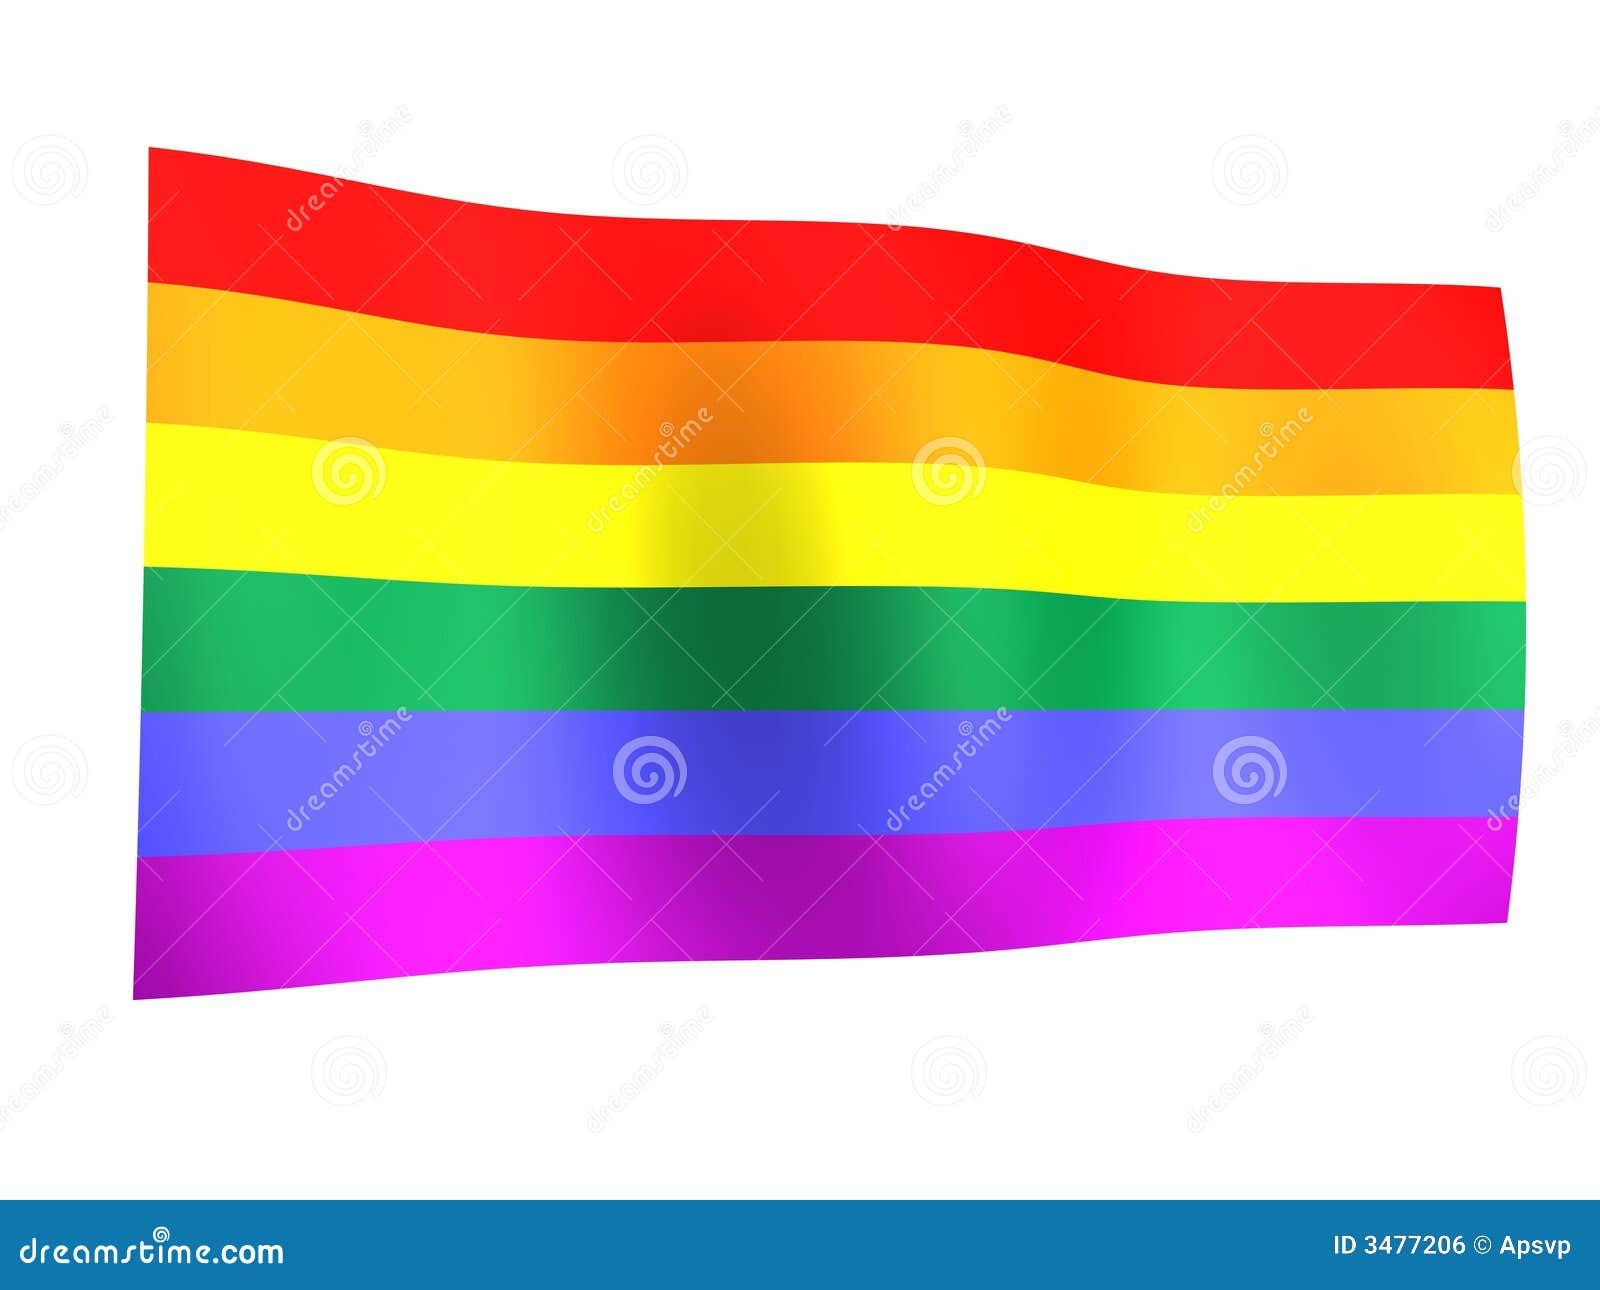 Orgullo del indicador del arco iris